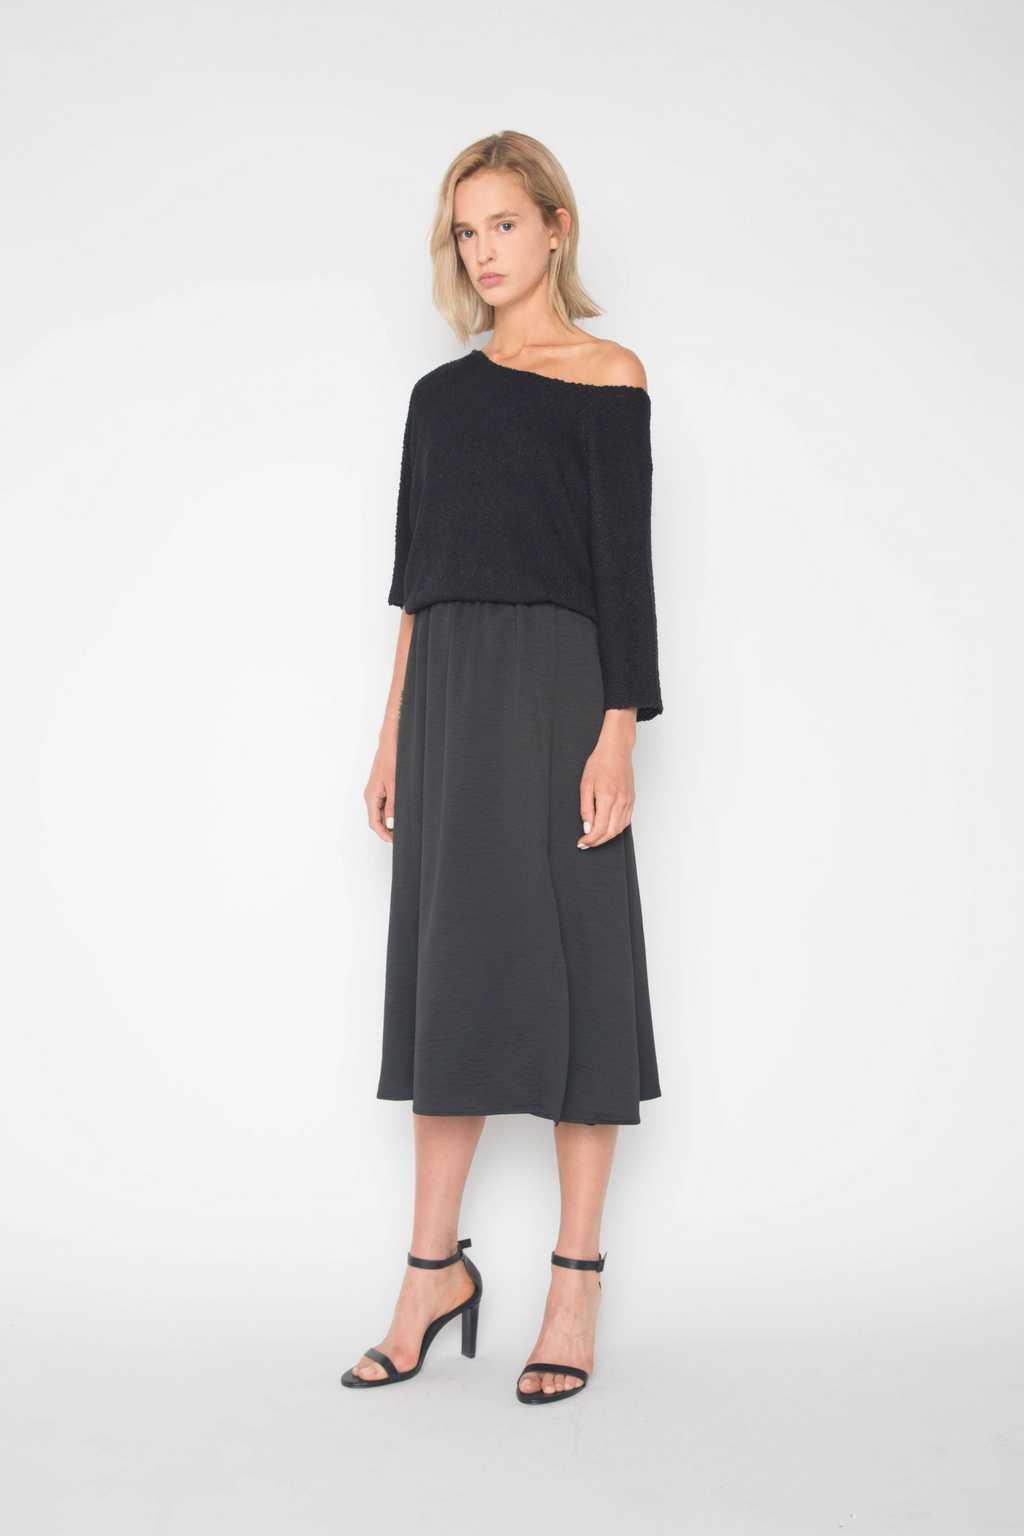 Sweater 1322 Black 3